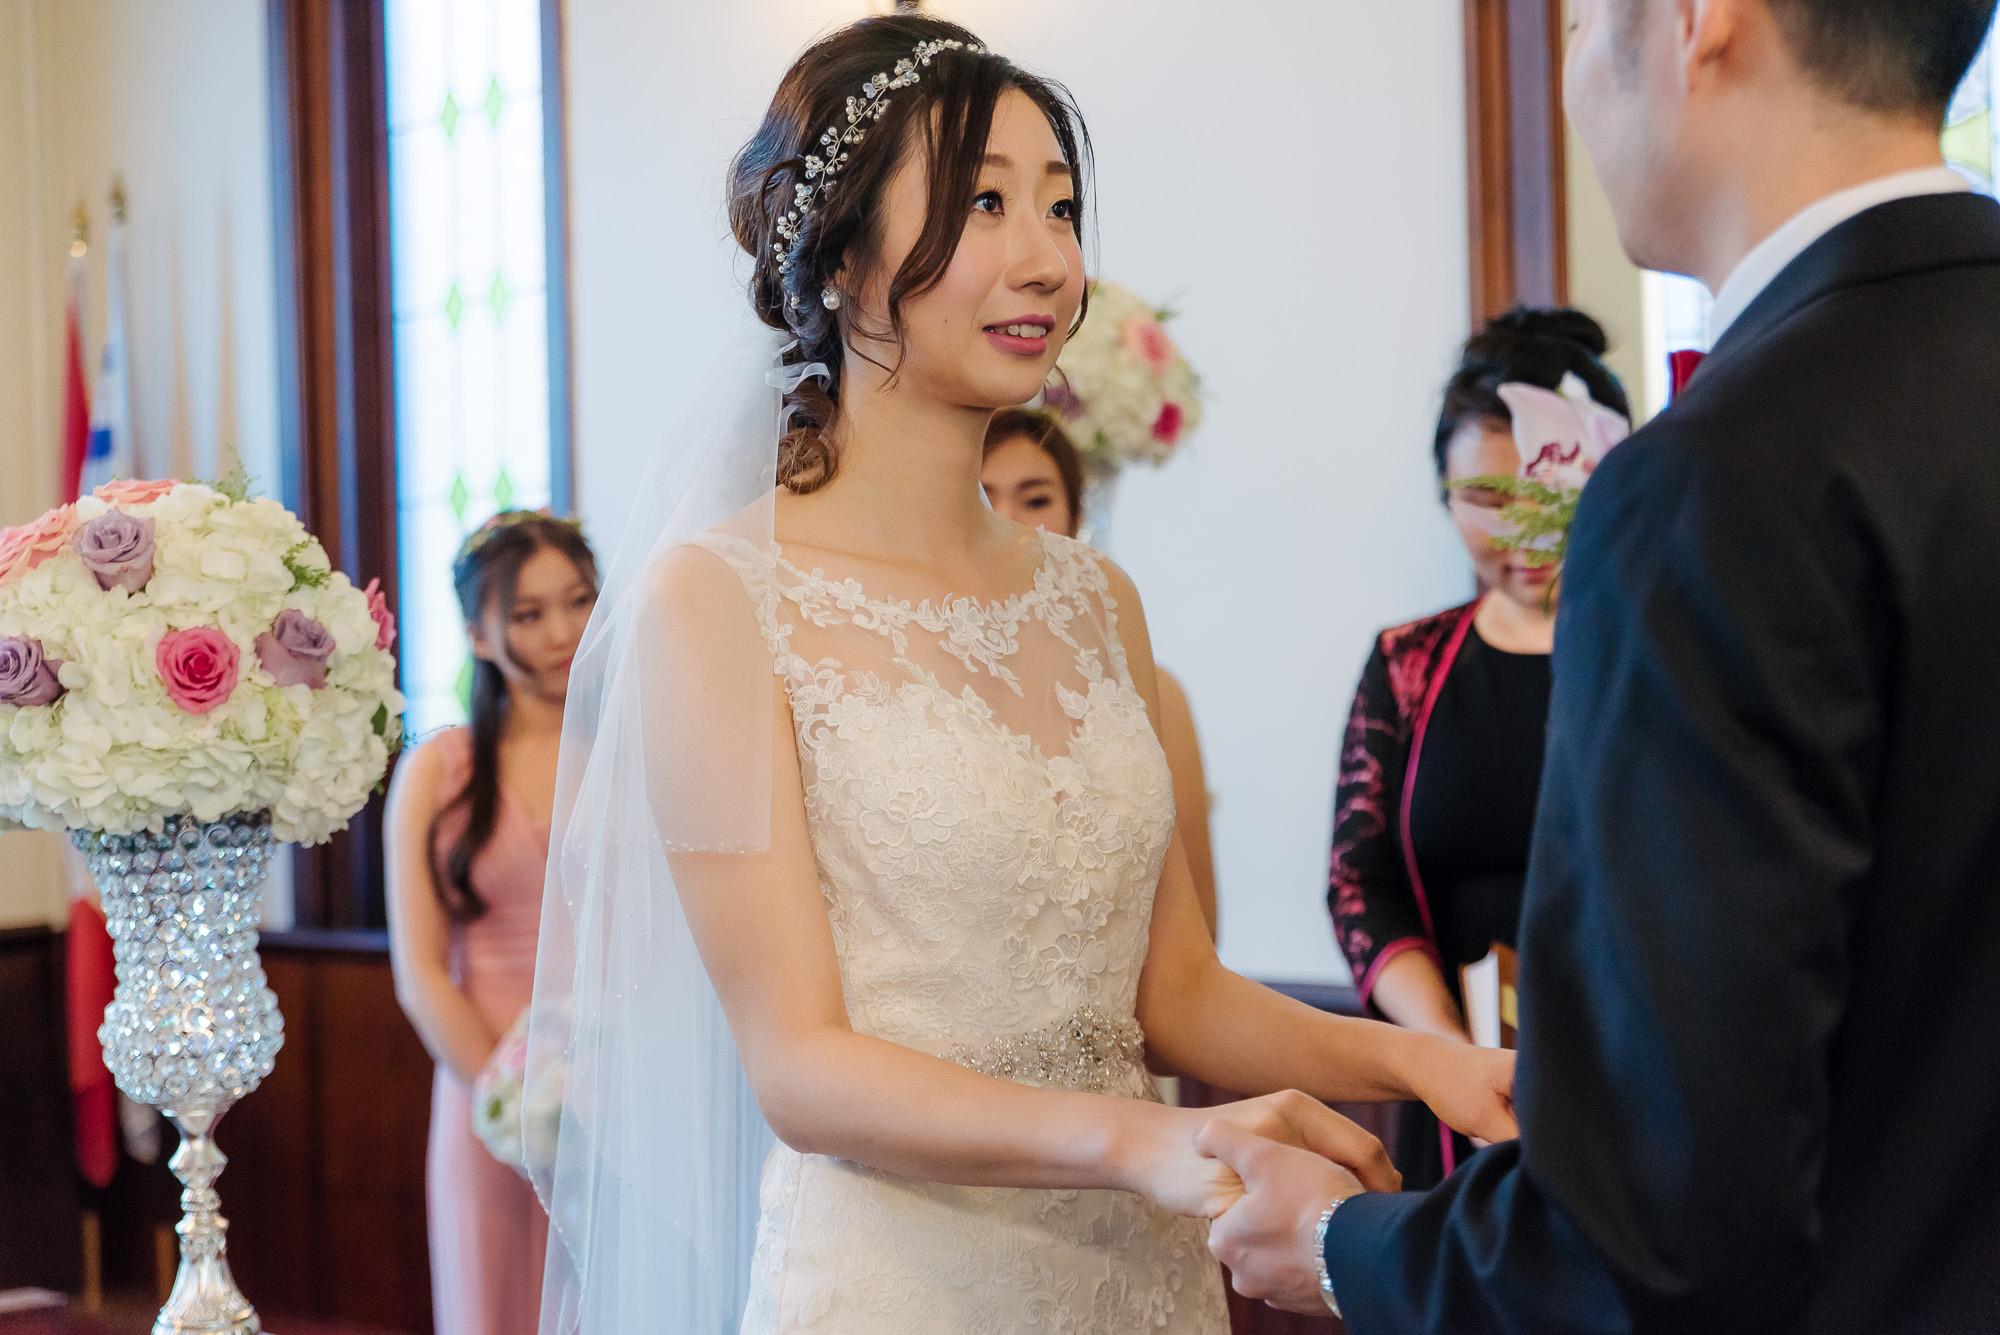 minoru_chapel_richmond_wedding_ceremony 16210010.jpg